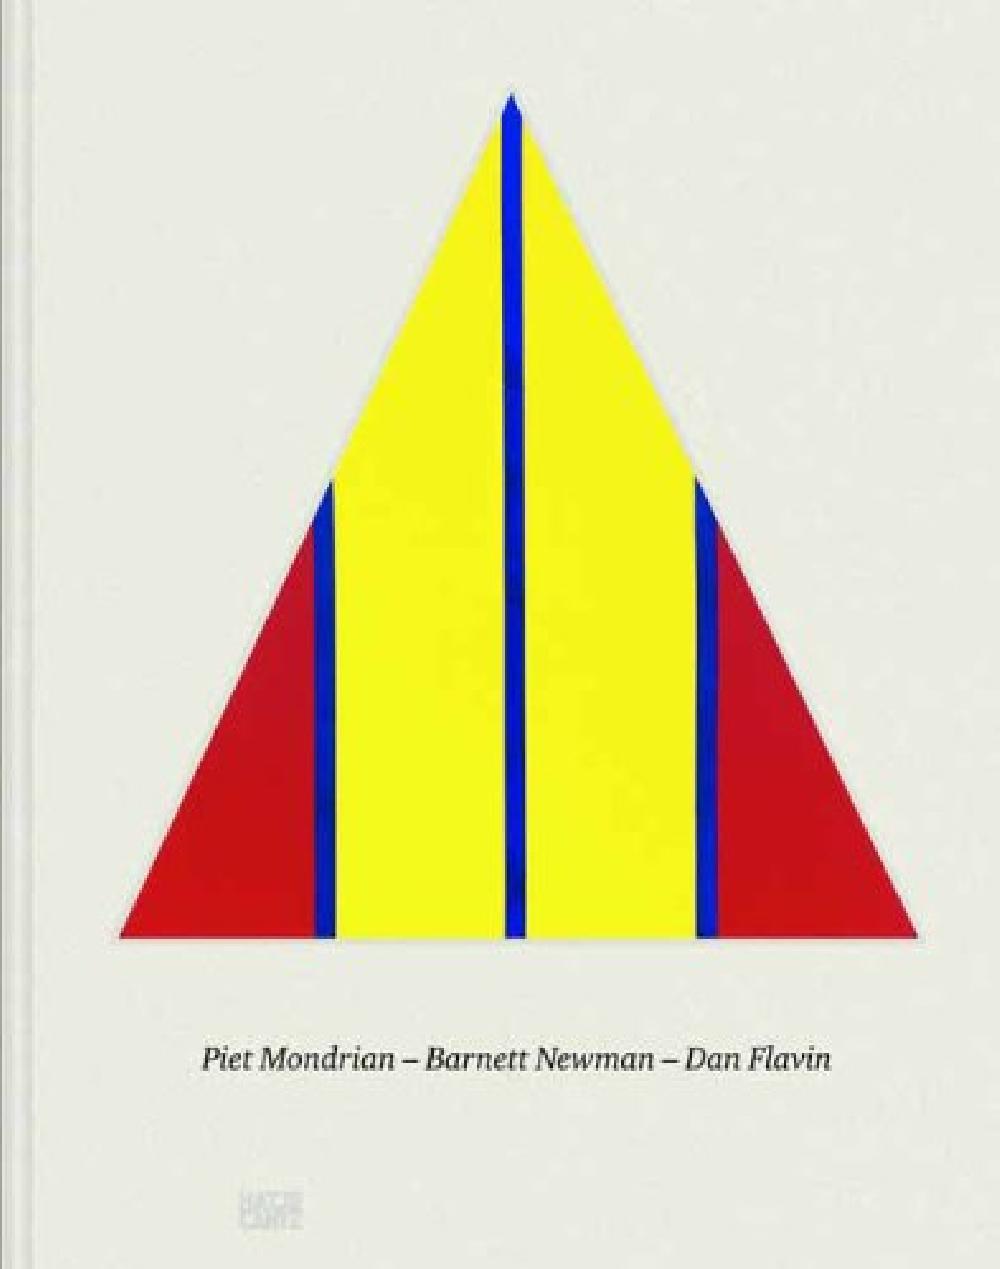 Piet Mondrian - Barnett Newman - Dan Flavin